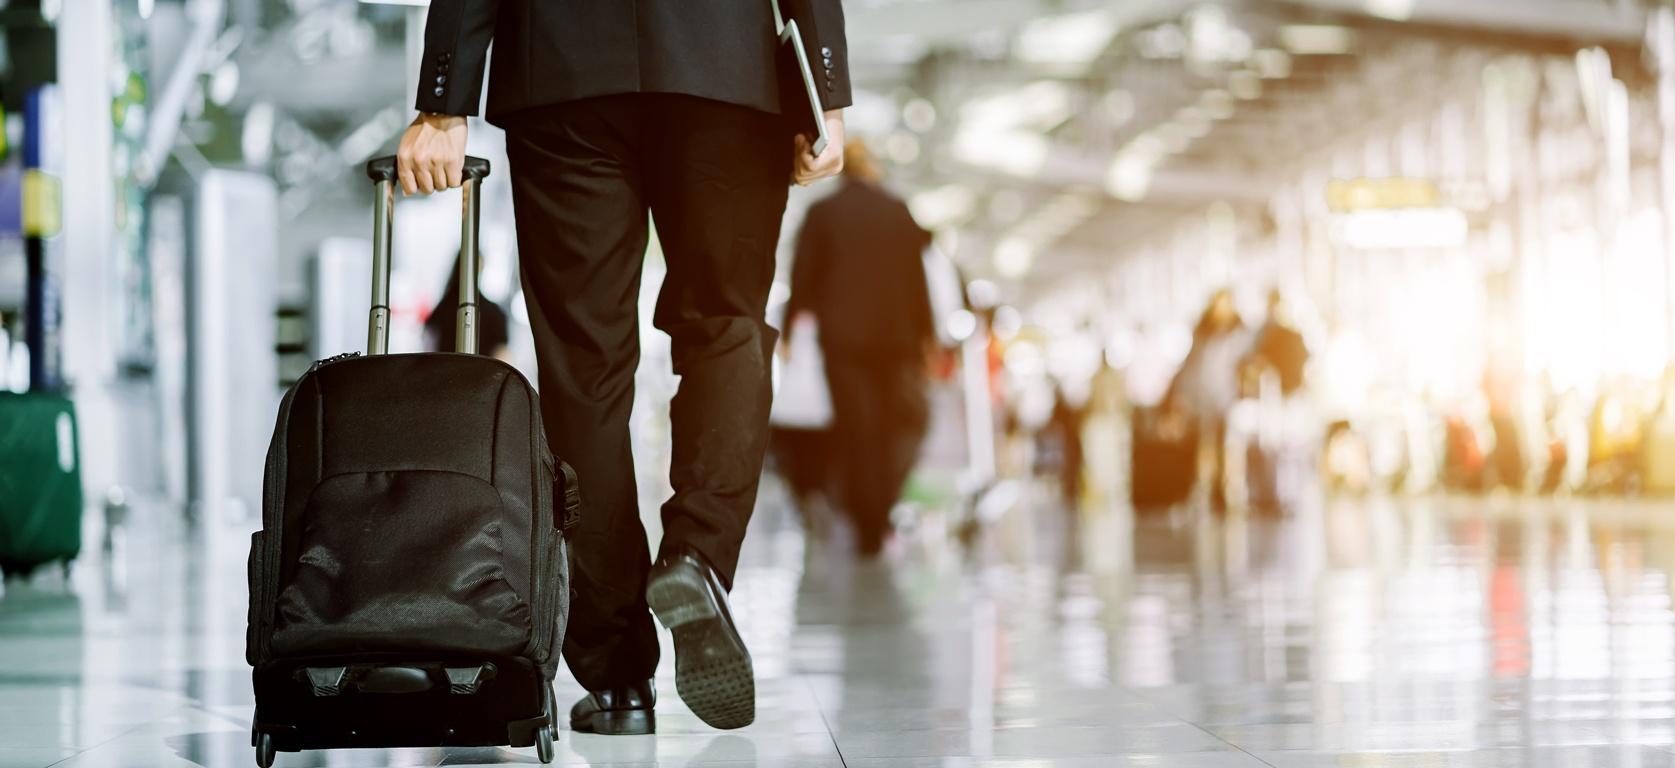 Заказ самолета | Бизнес авиация | Деловая авиация | Аренда самолета - VIP Service